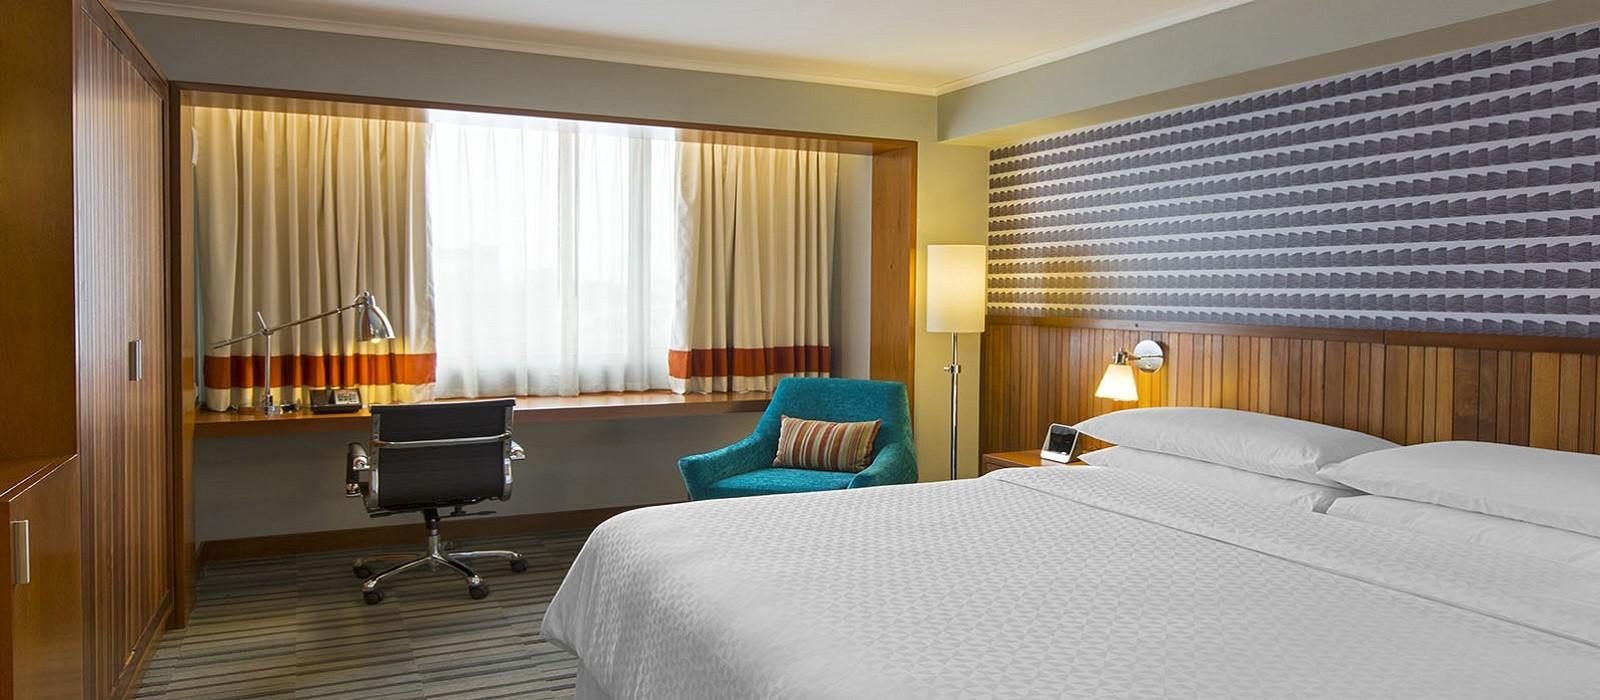 Hotel Four Points By Sheraton Miraflores Peru